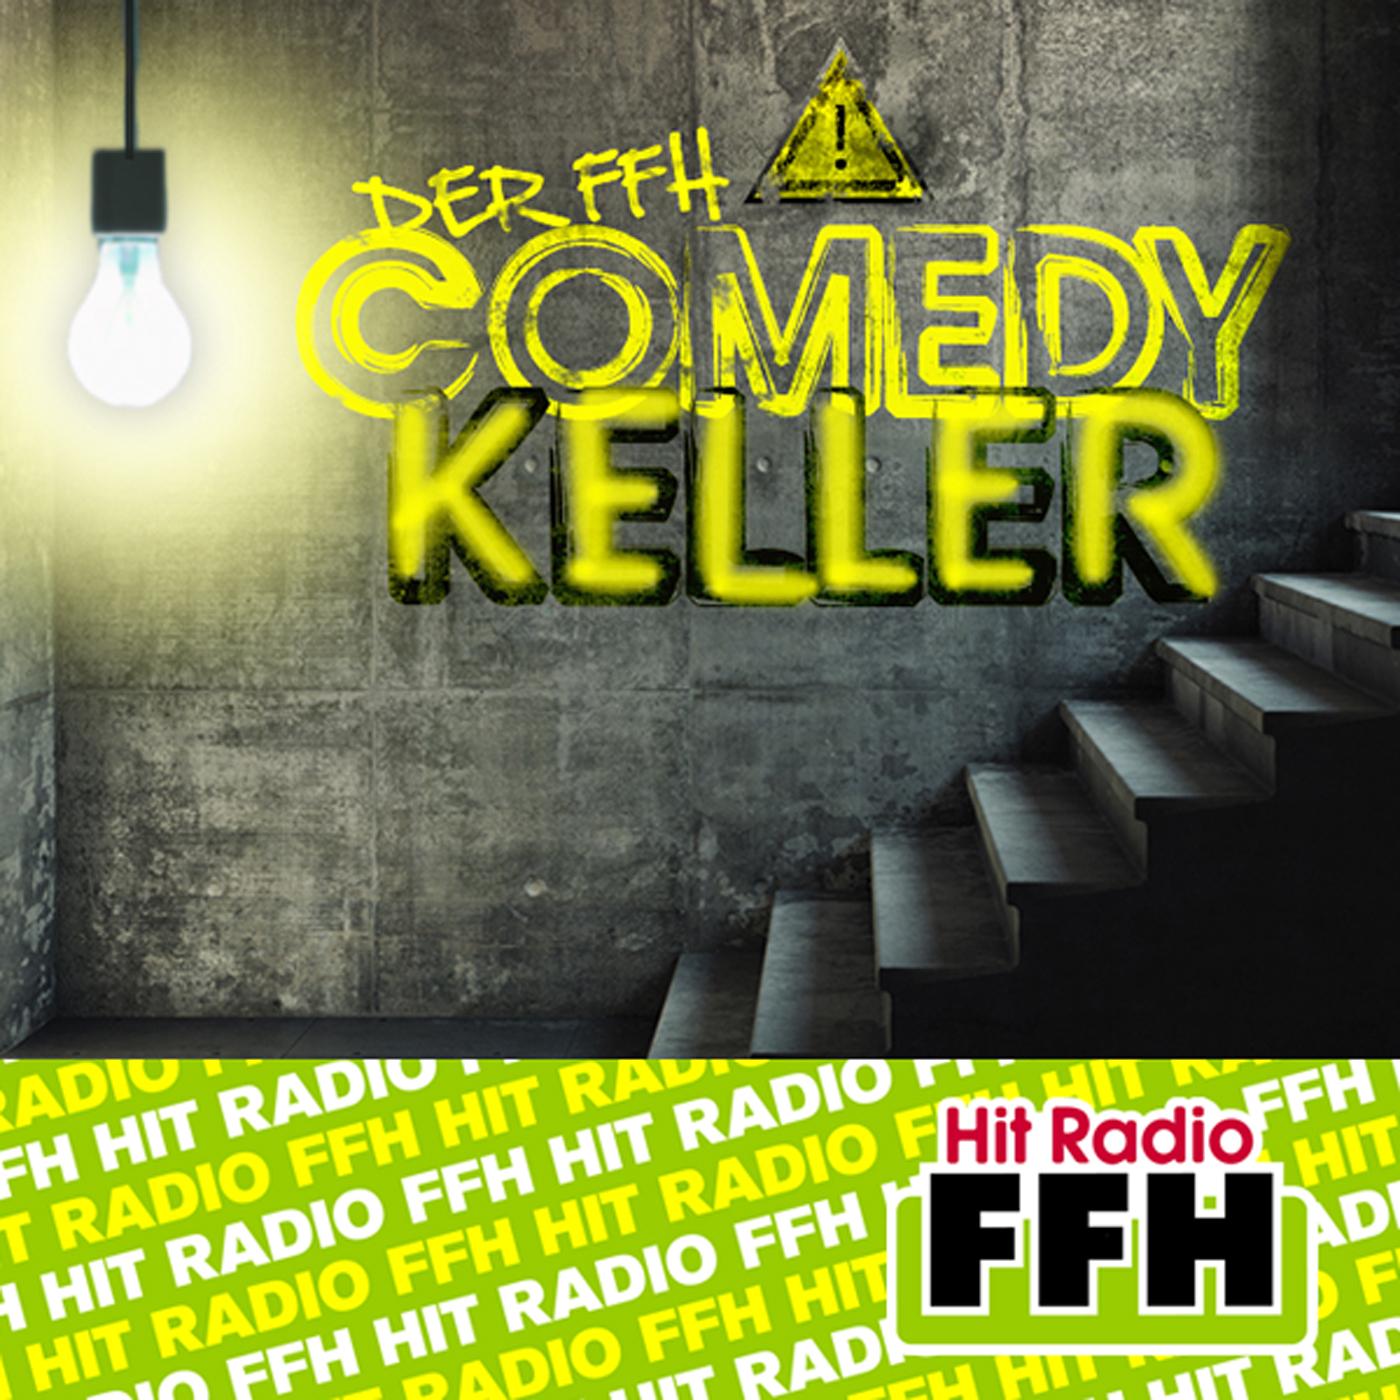 <![CDATA[Der FFH-Comedy-Keller]]>